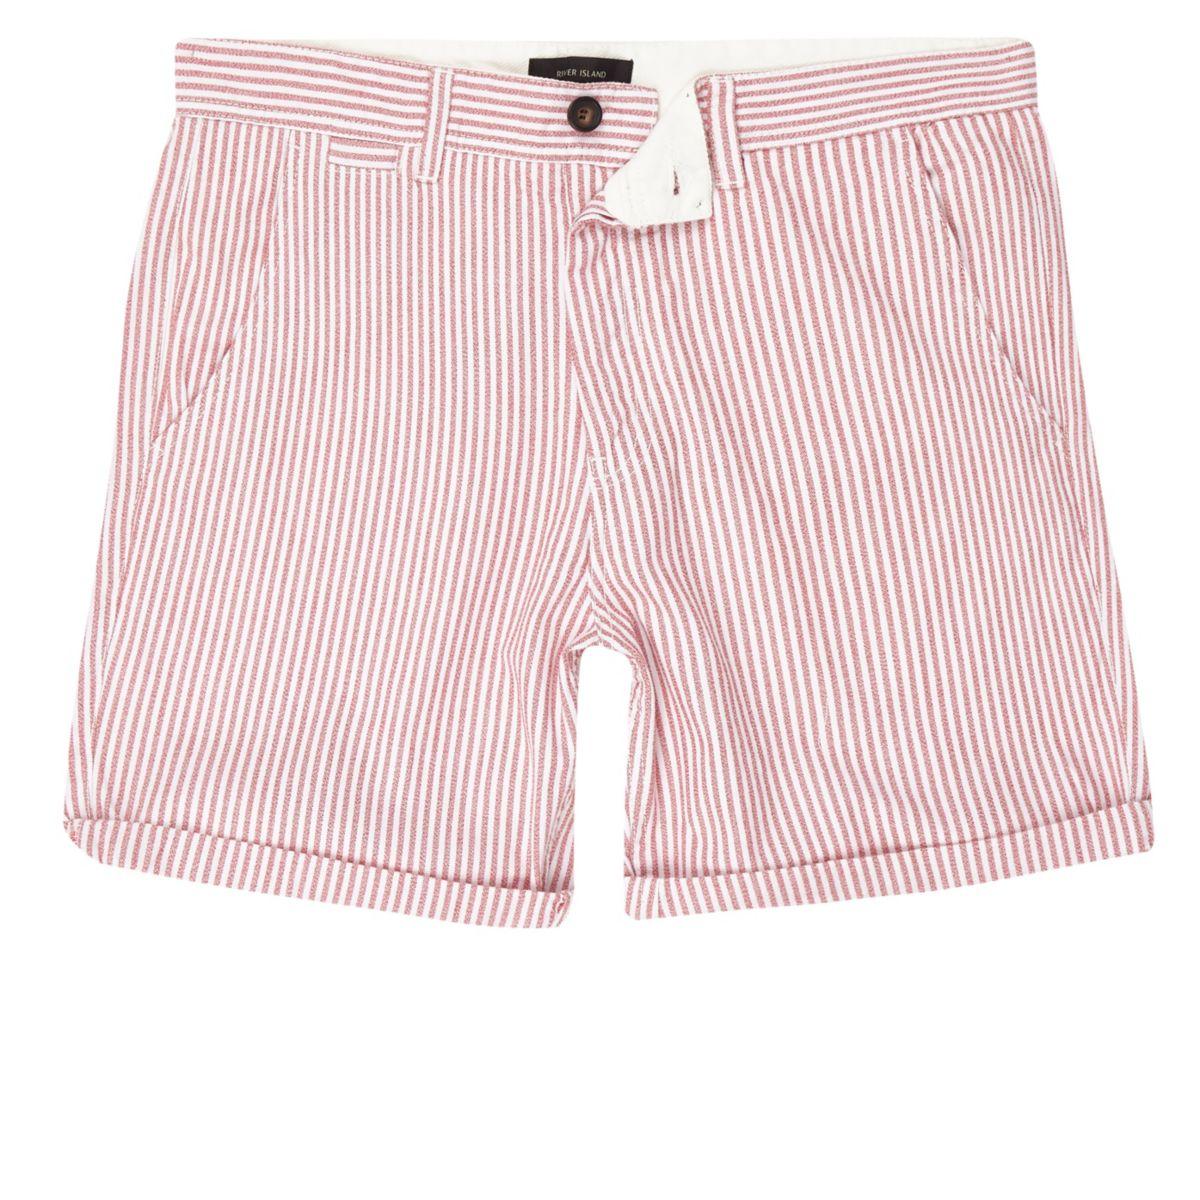 Red stripe chino shorts